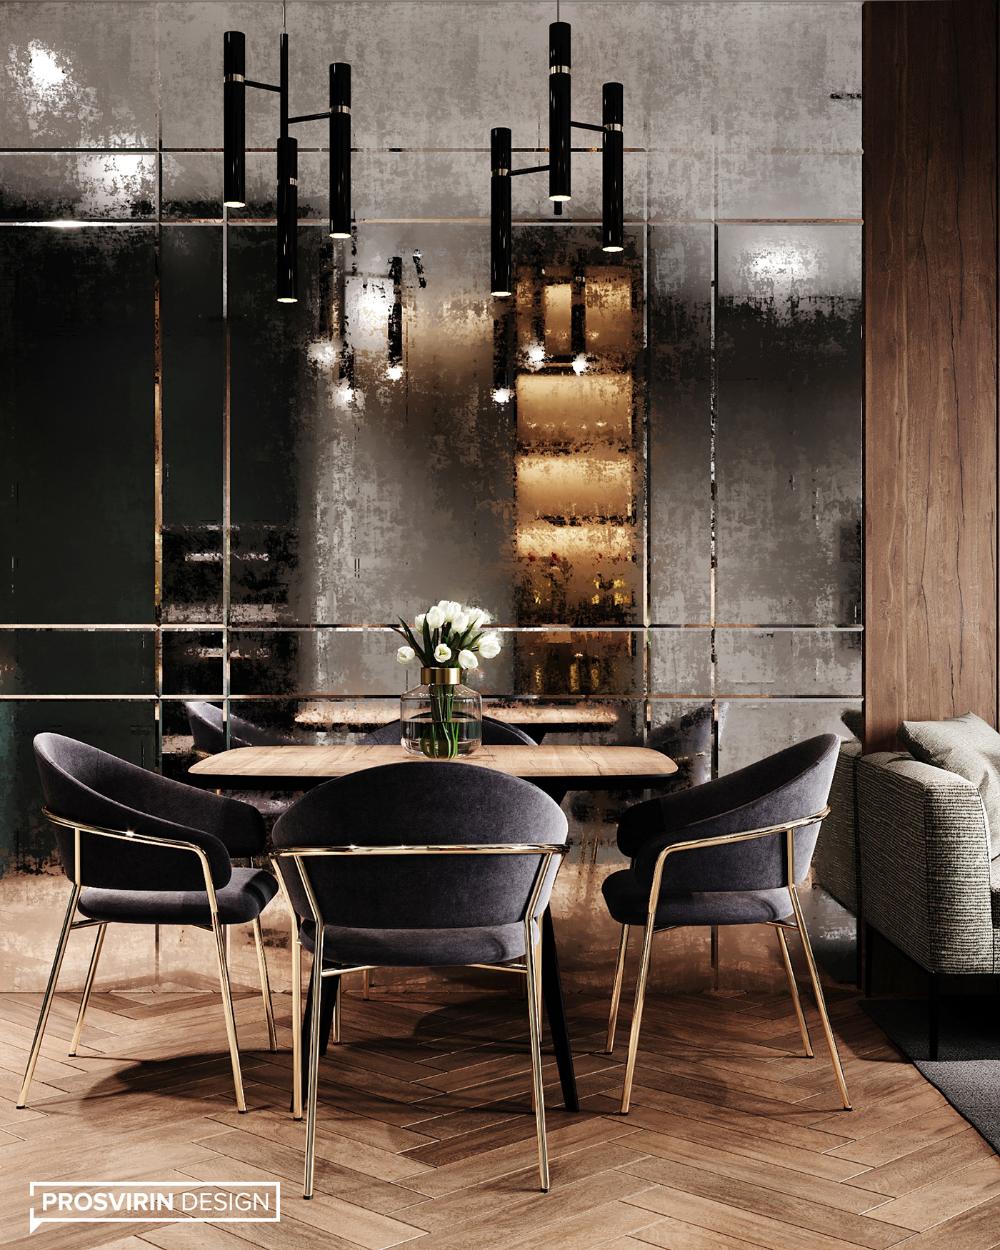 Autodesk Room Design: Design, Small Apartments